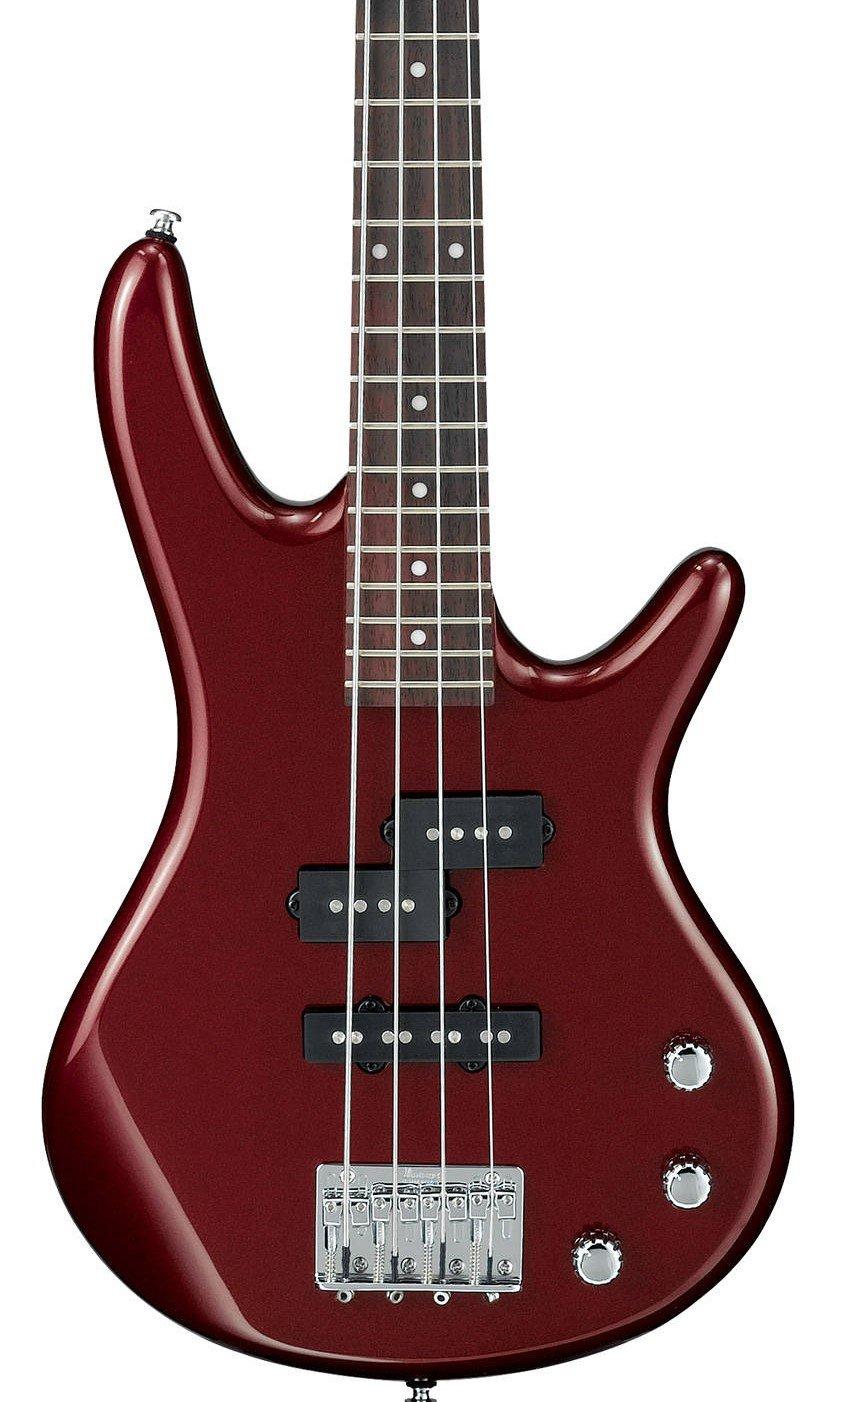 Ibanez GSRM20 miKro Bass - RBM (Rootbeer Metallic)